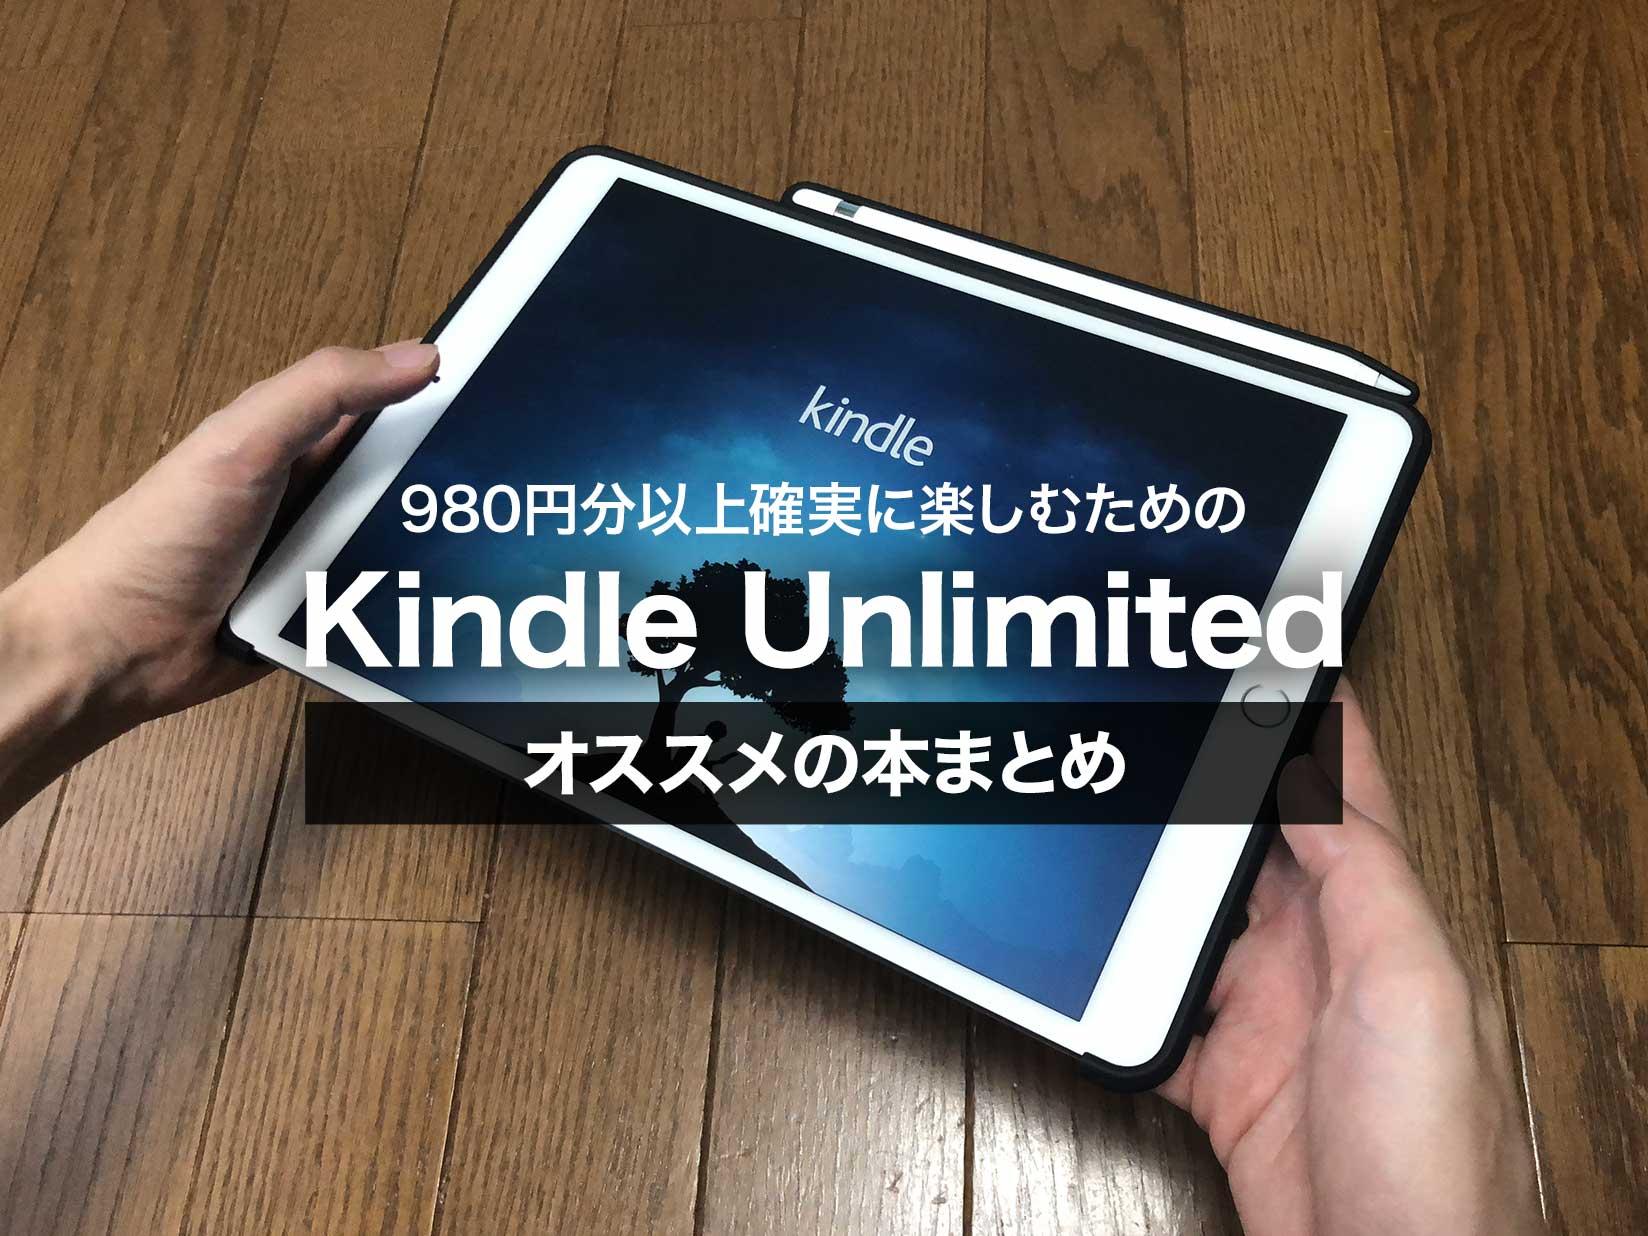 Kindle Unlimitedでオススメの本まとめ